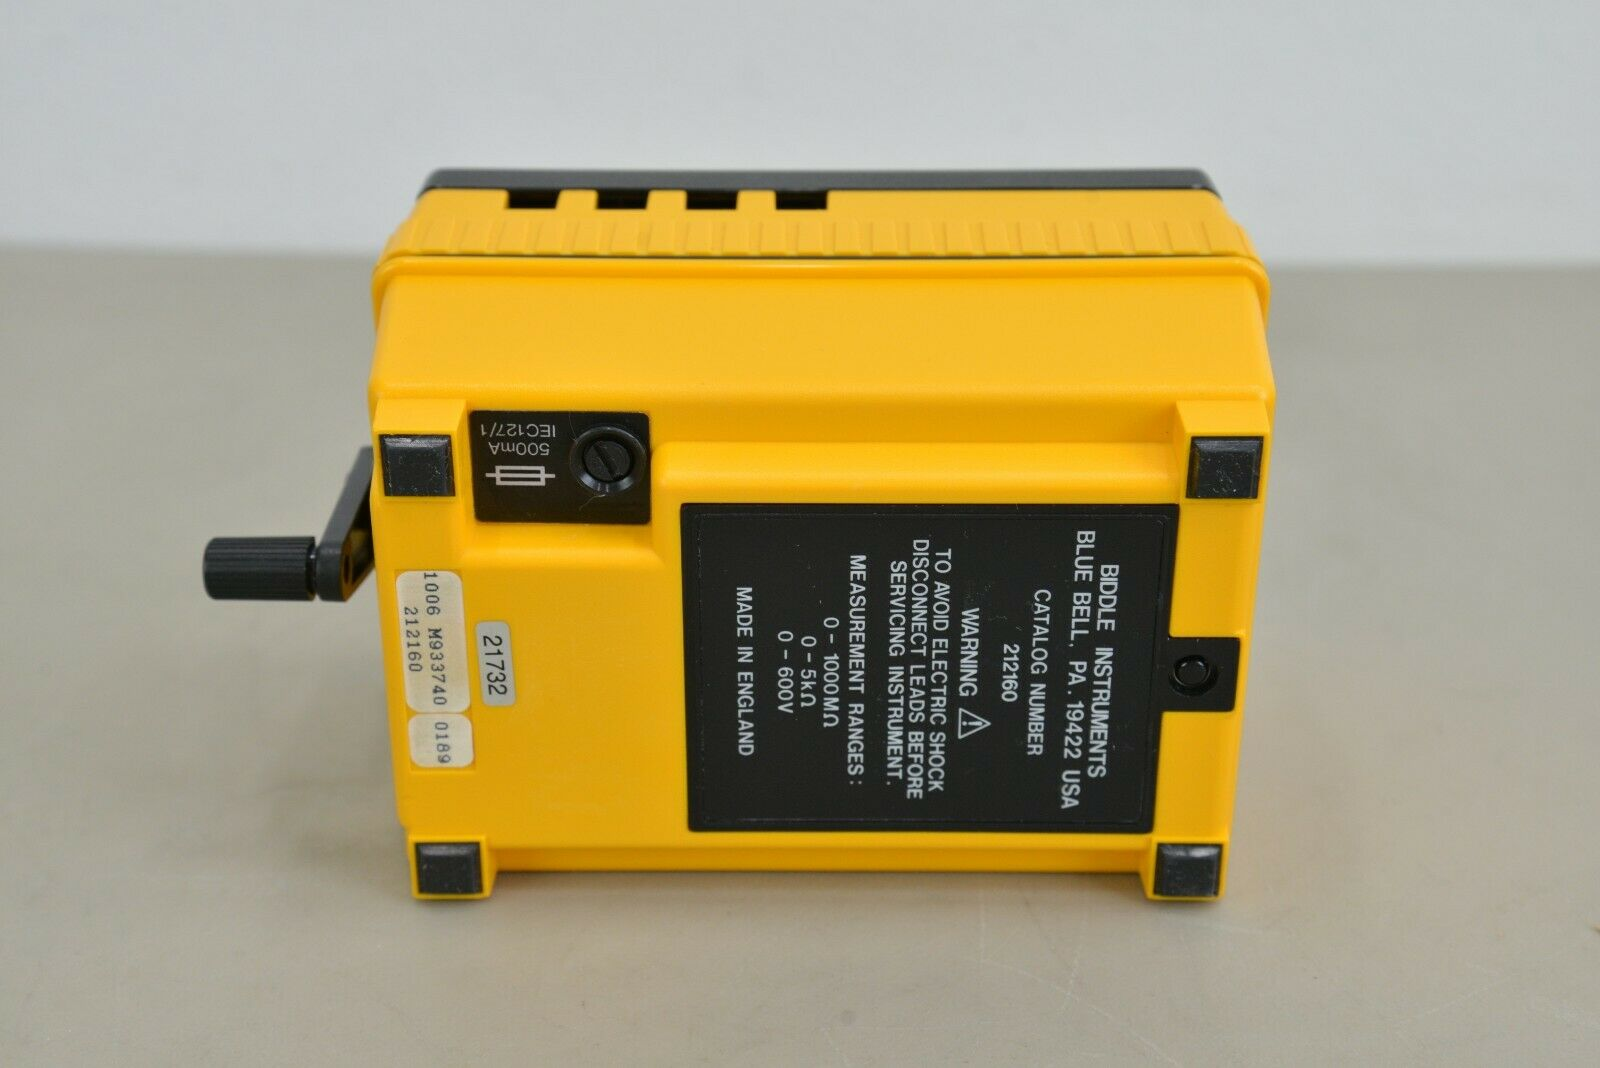 Biddle Megger Hand Crank Insulation Tester Model 212160 21732 Rhino Trade Llc